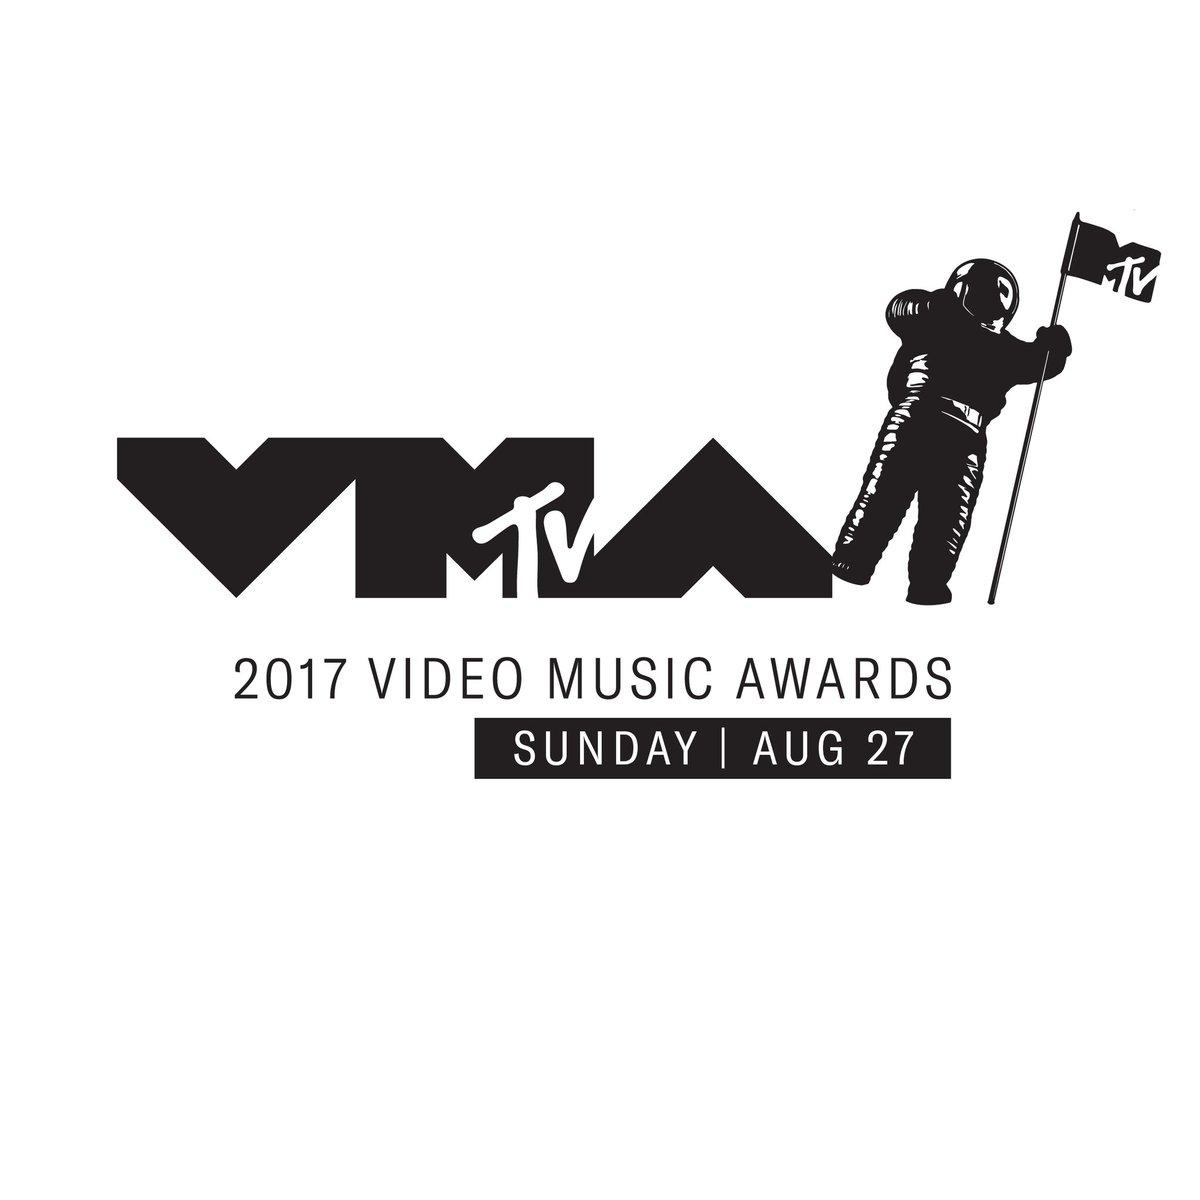 Mtv Video Music Awards Winners List